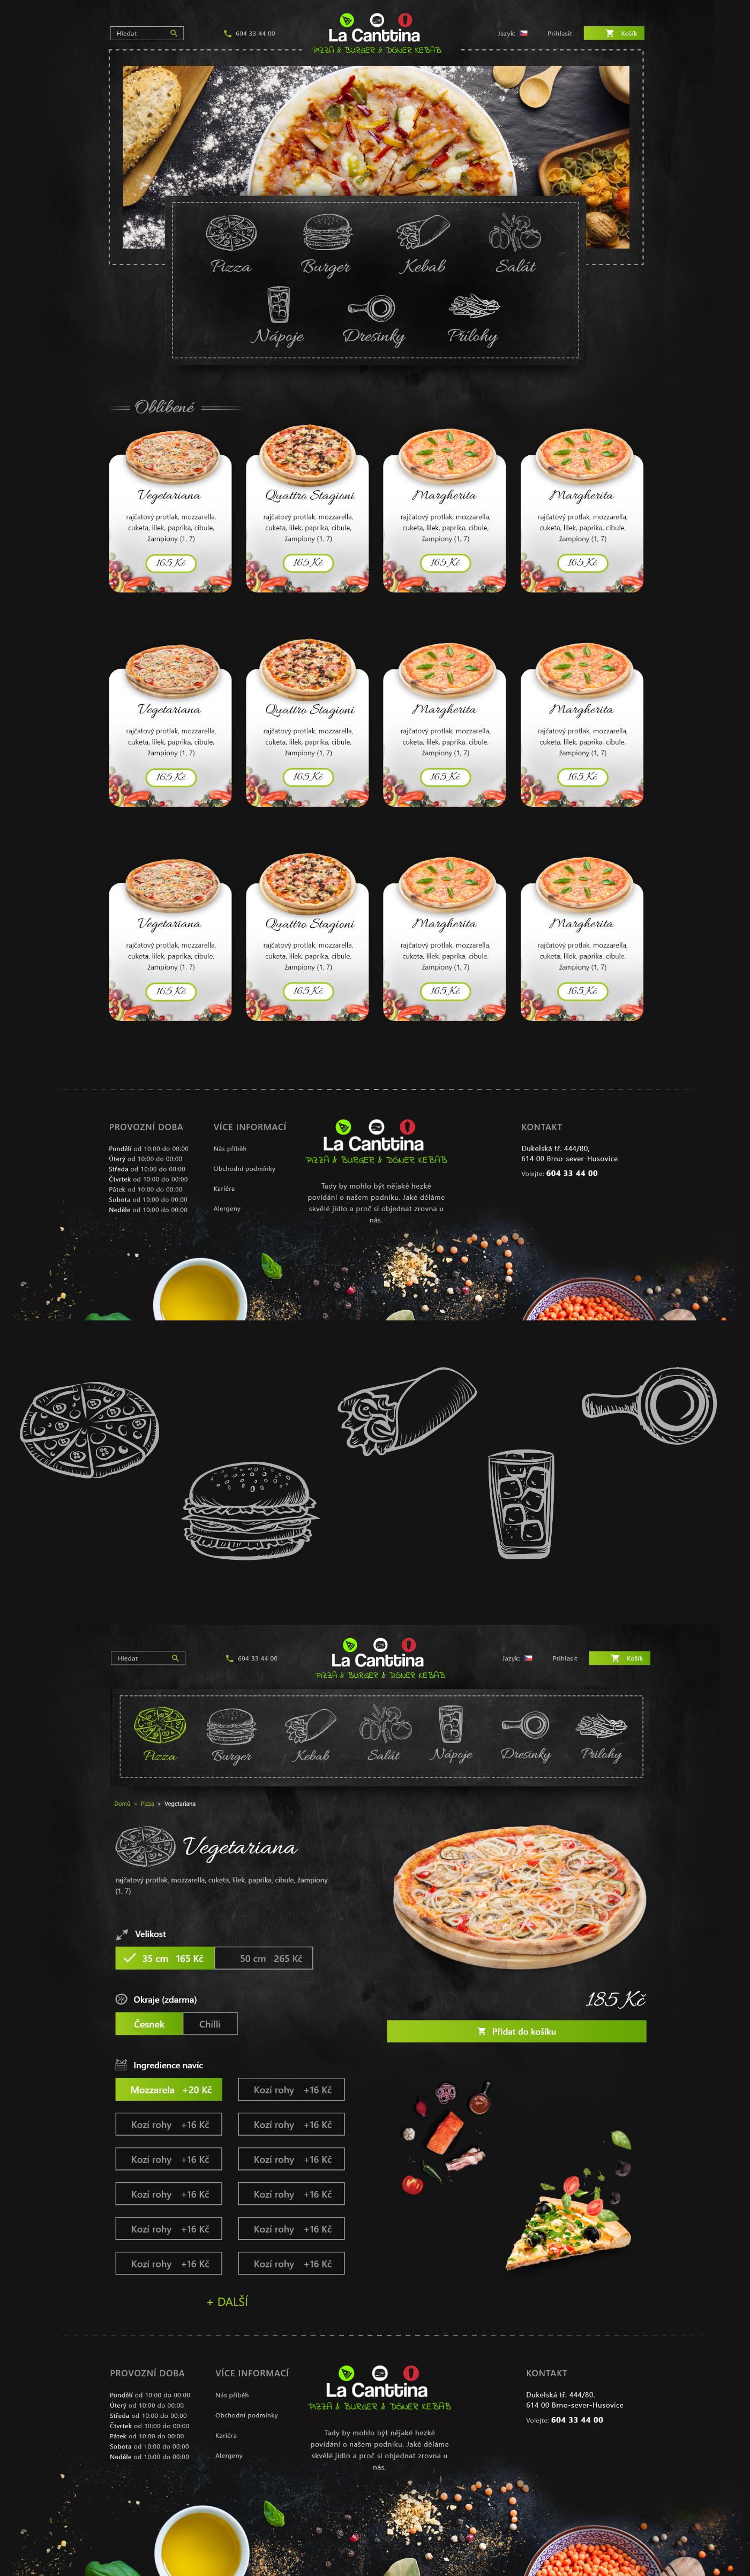 Food  Pizza eat gastronomy restaurant dark black xD ILLUSTRATION  icons